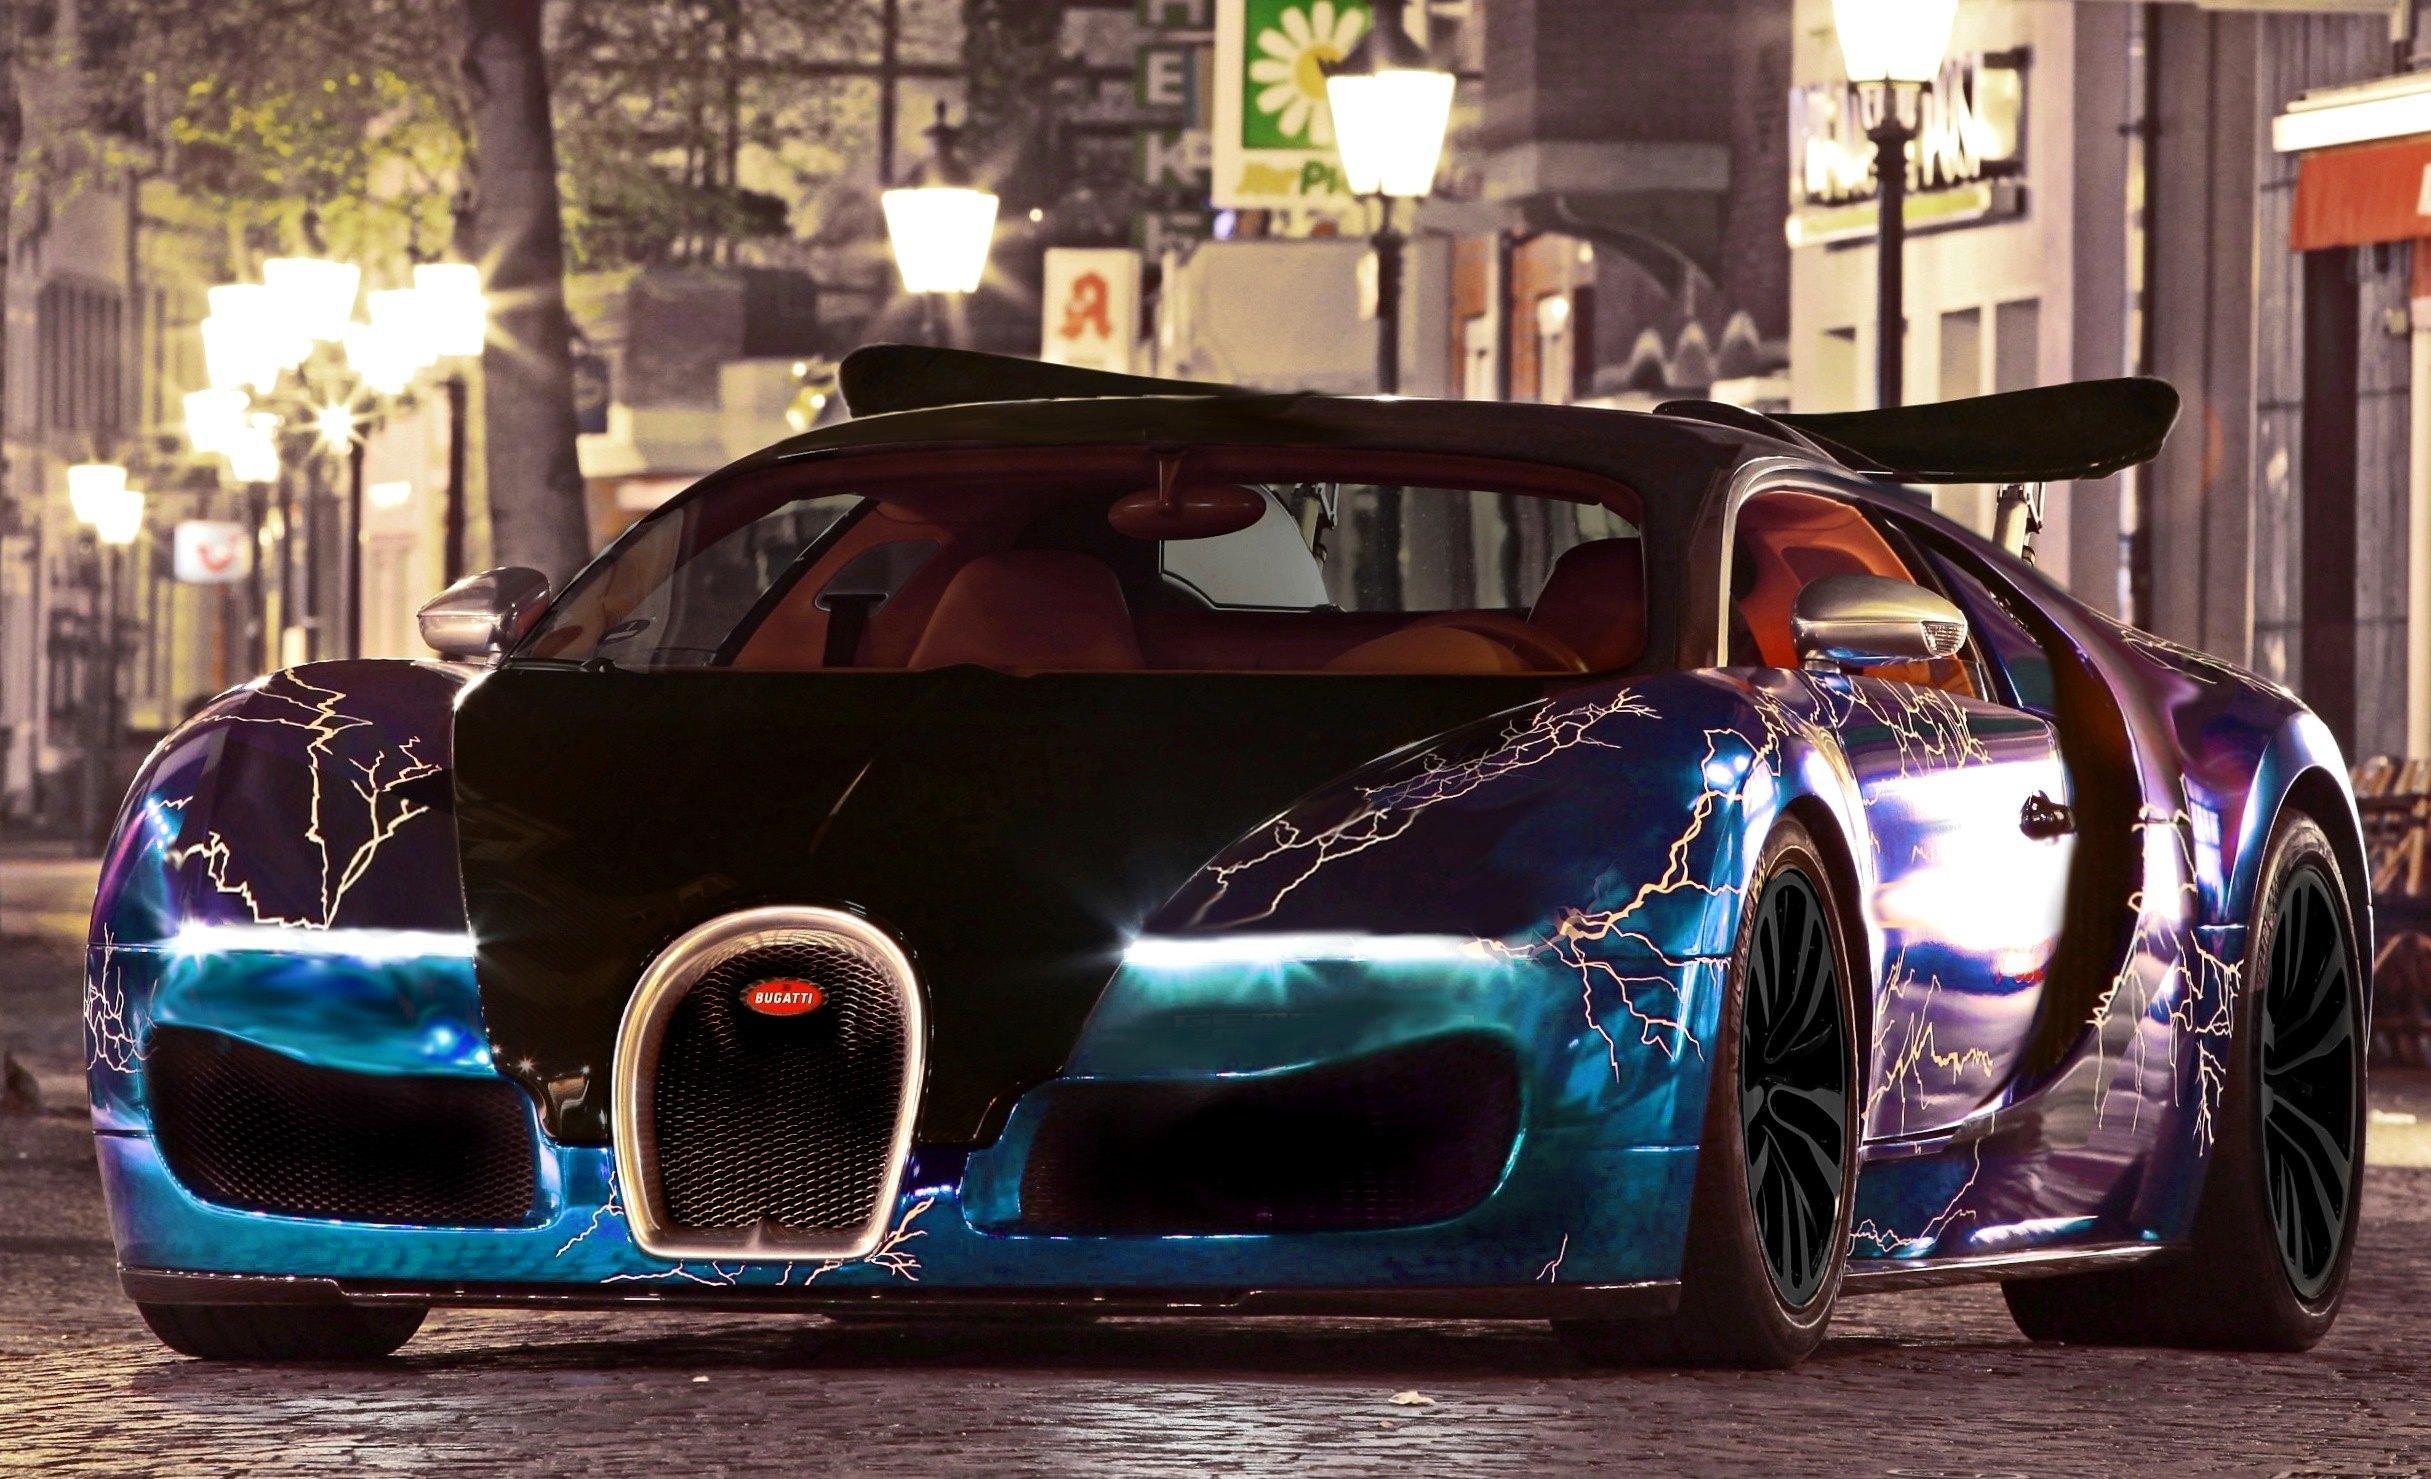 bugatti car 2018. beautiful bugatti bugattiveyronlightningwrapbycamshaftforgemballagmdsdcfdzdgvbh15 intended bugatti car 2018